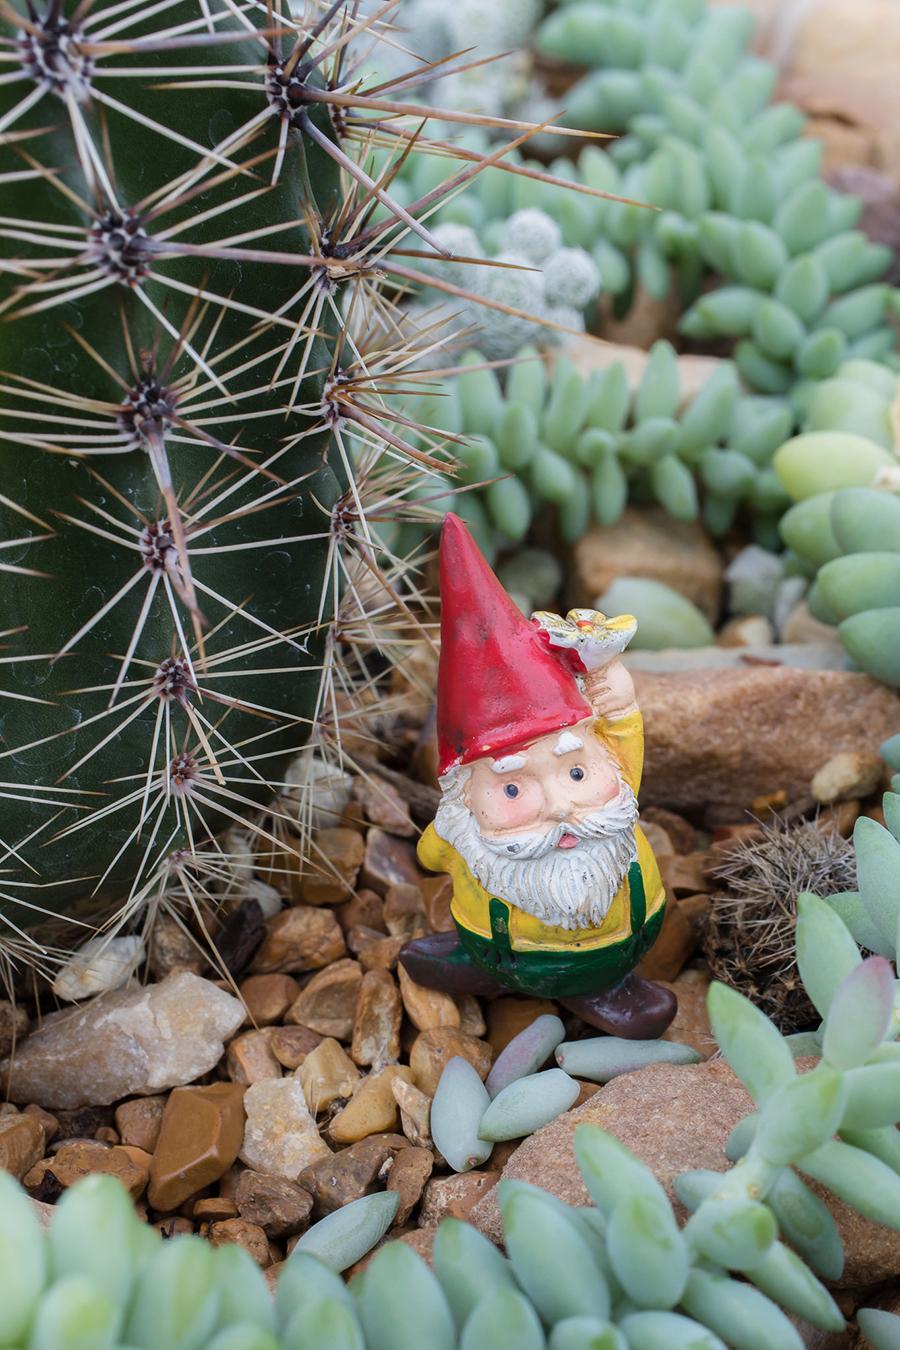 cactus garden gnome - april bern photography